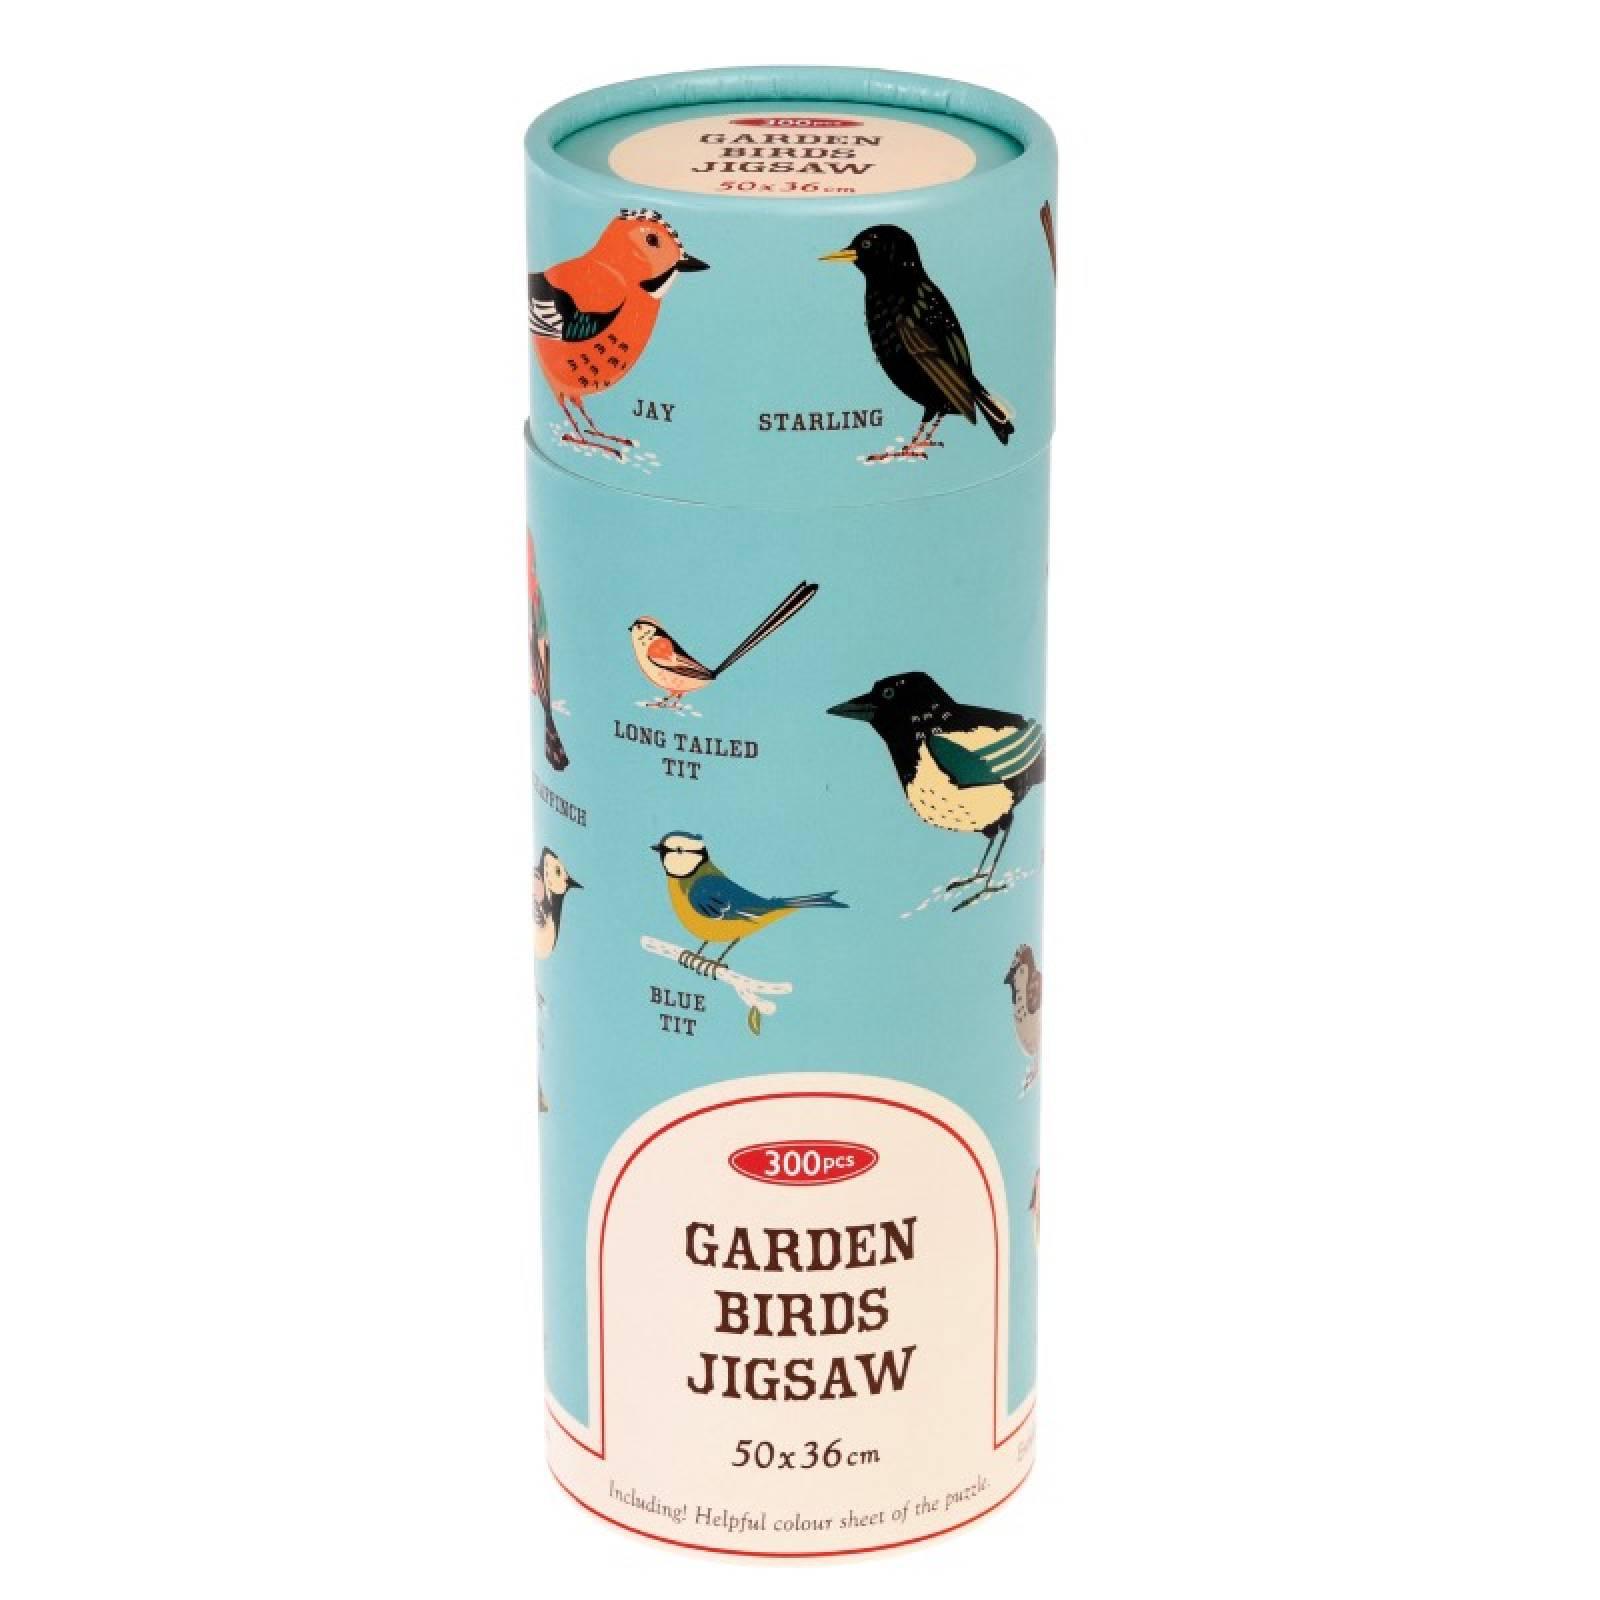 Garden Birds Puzzle In Tube Box thumbnails